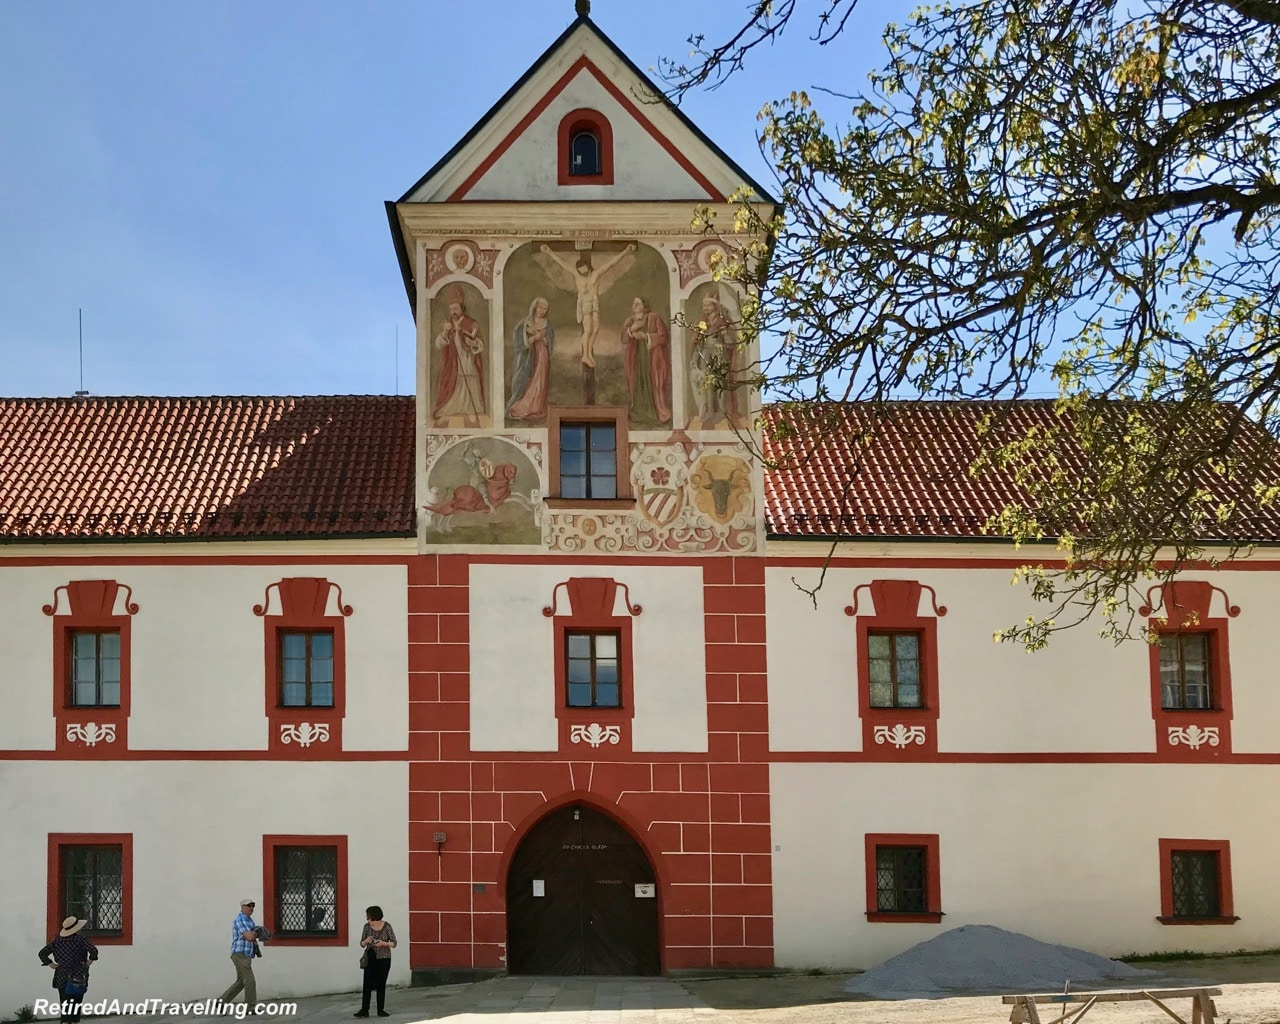 Rozmberk Vyssi Brod Cistercian Abbey - Churches And Castles In The Czech Republic.jpg